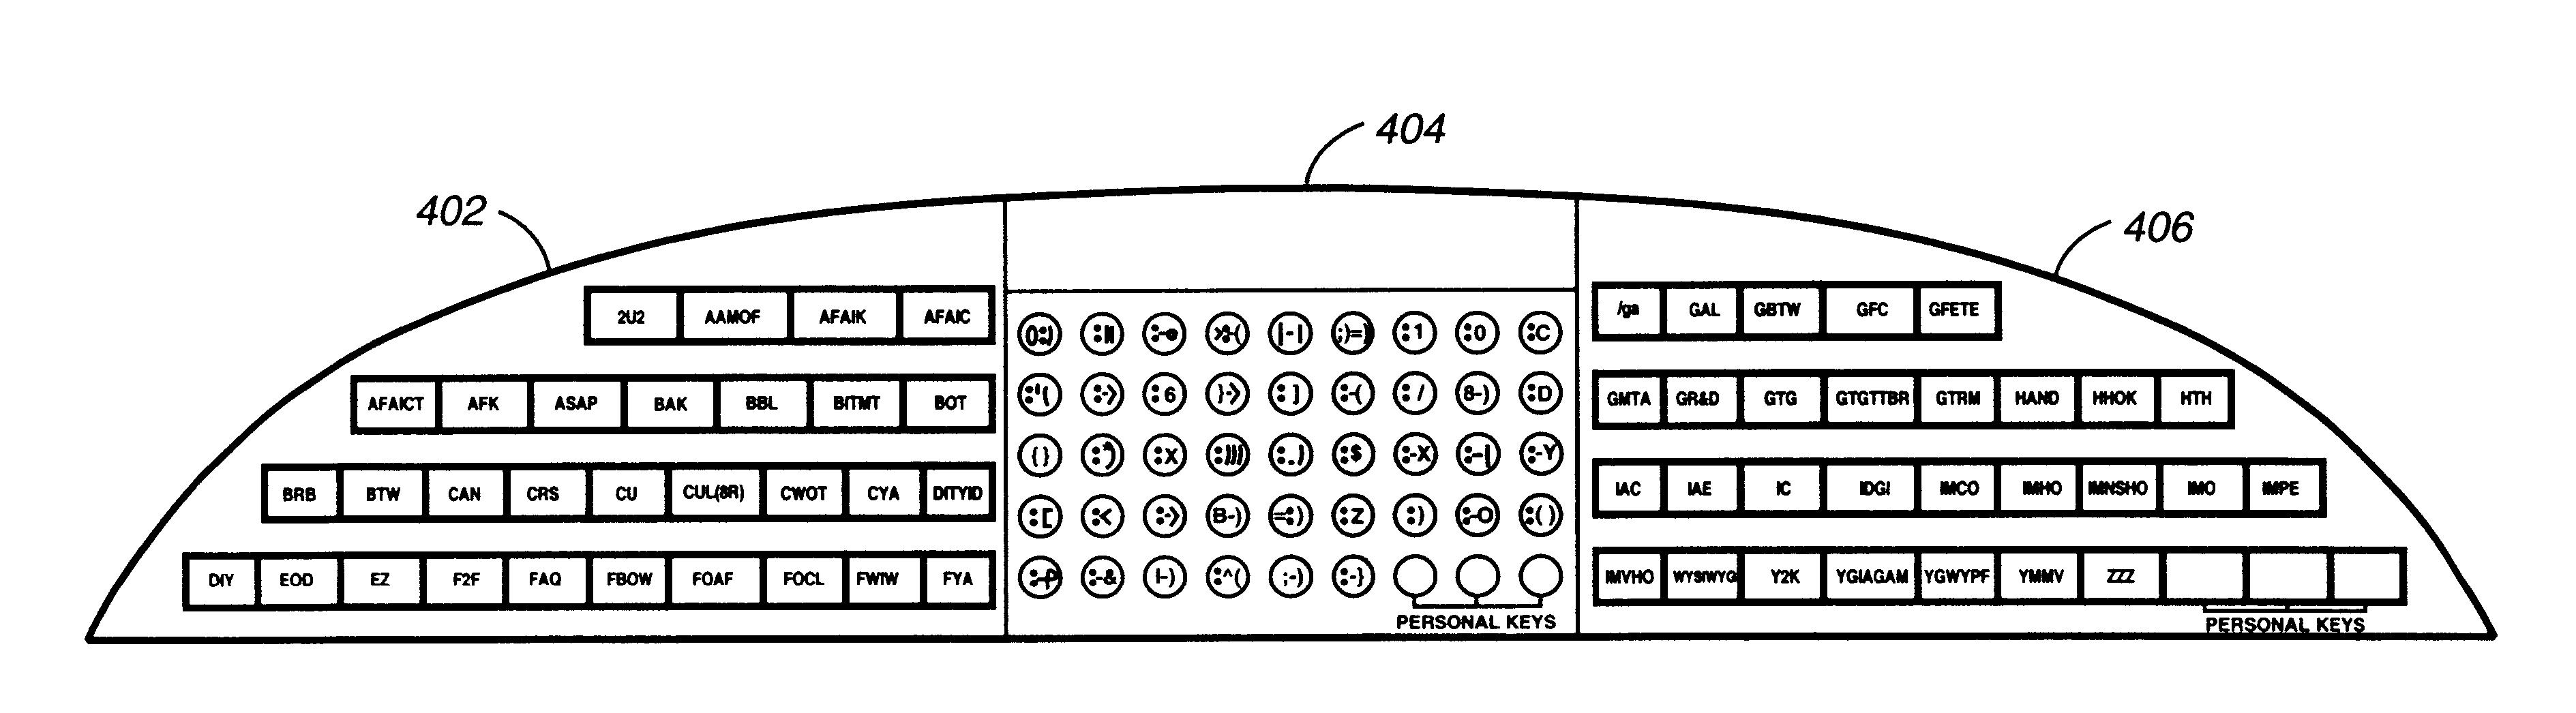 Lotus Notes Emoticons Patent Us6629793 Emoticon Keyboard Google Patents